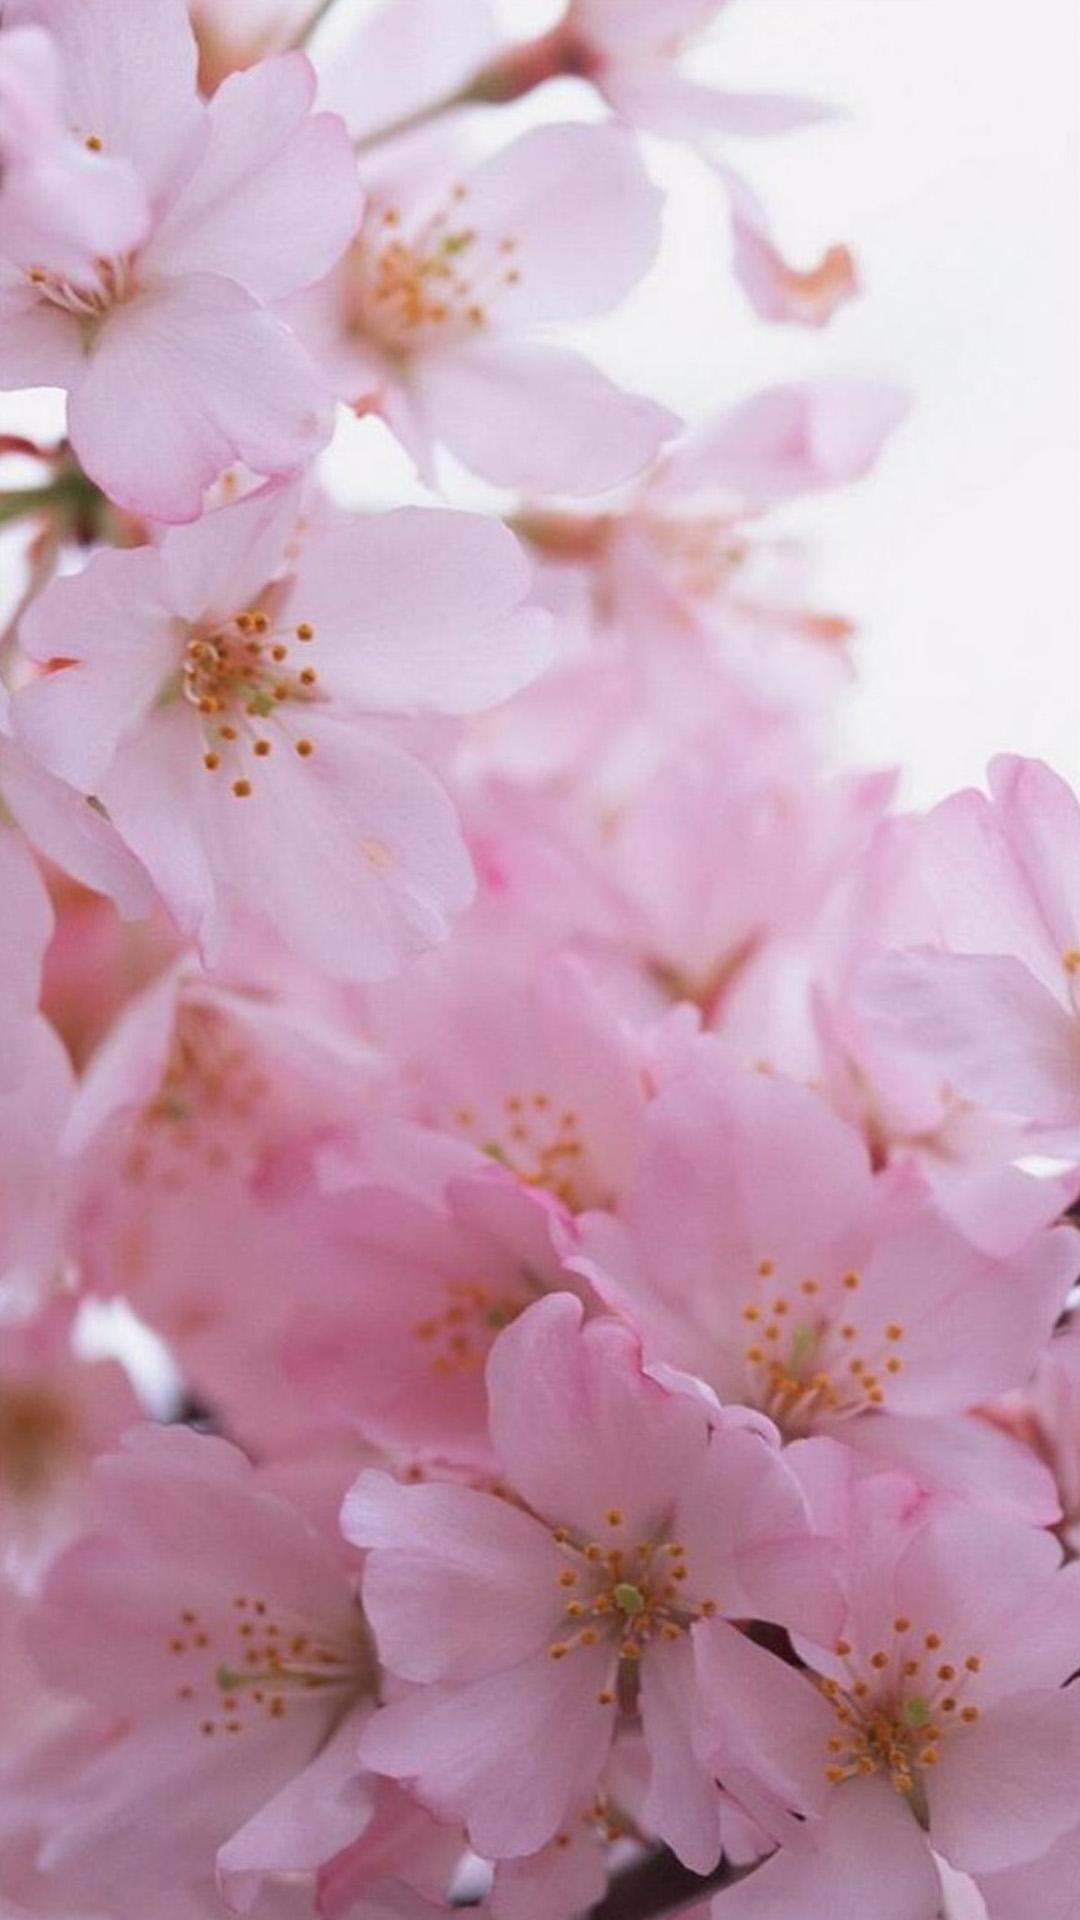 586574842 iphone 6 plus flower wallpaper ebfd7464a1bc555ec44d6b7e626c2d5b raw